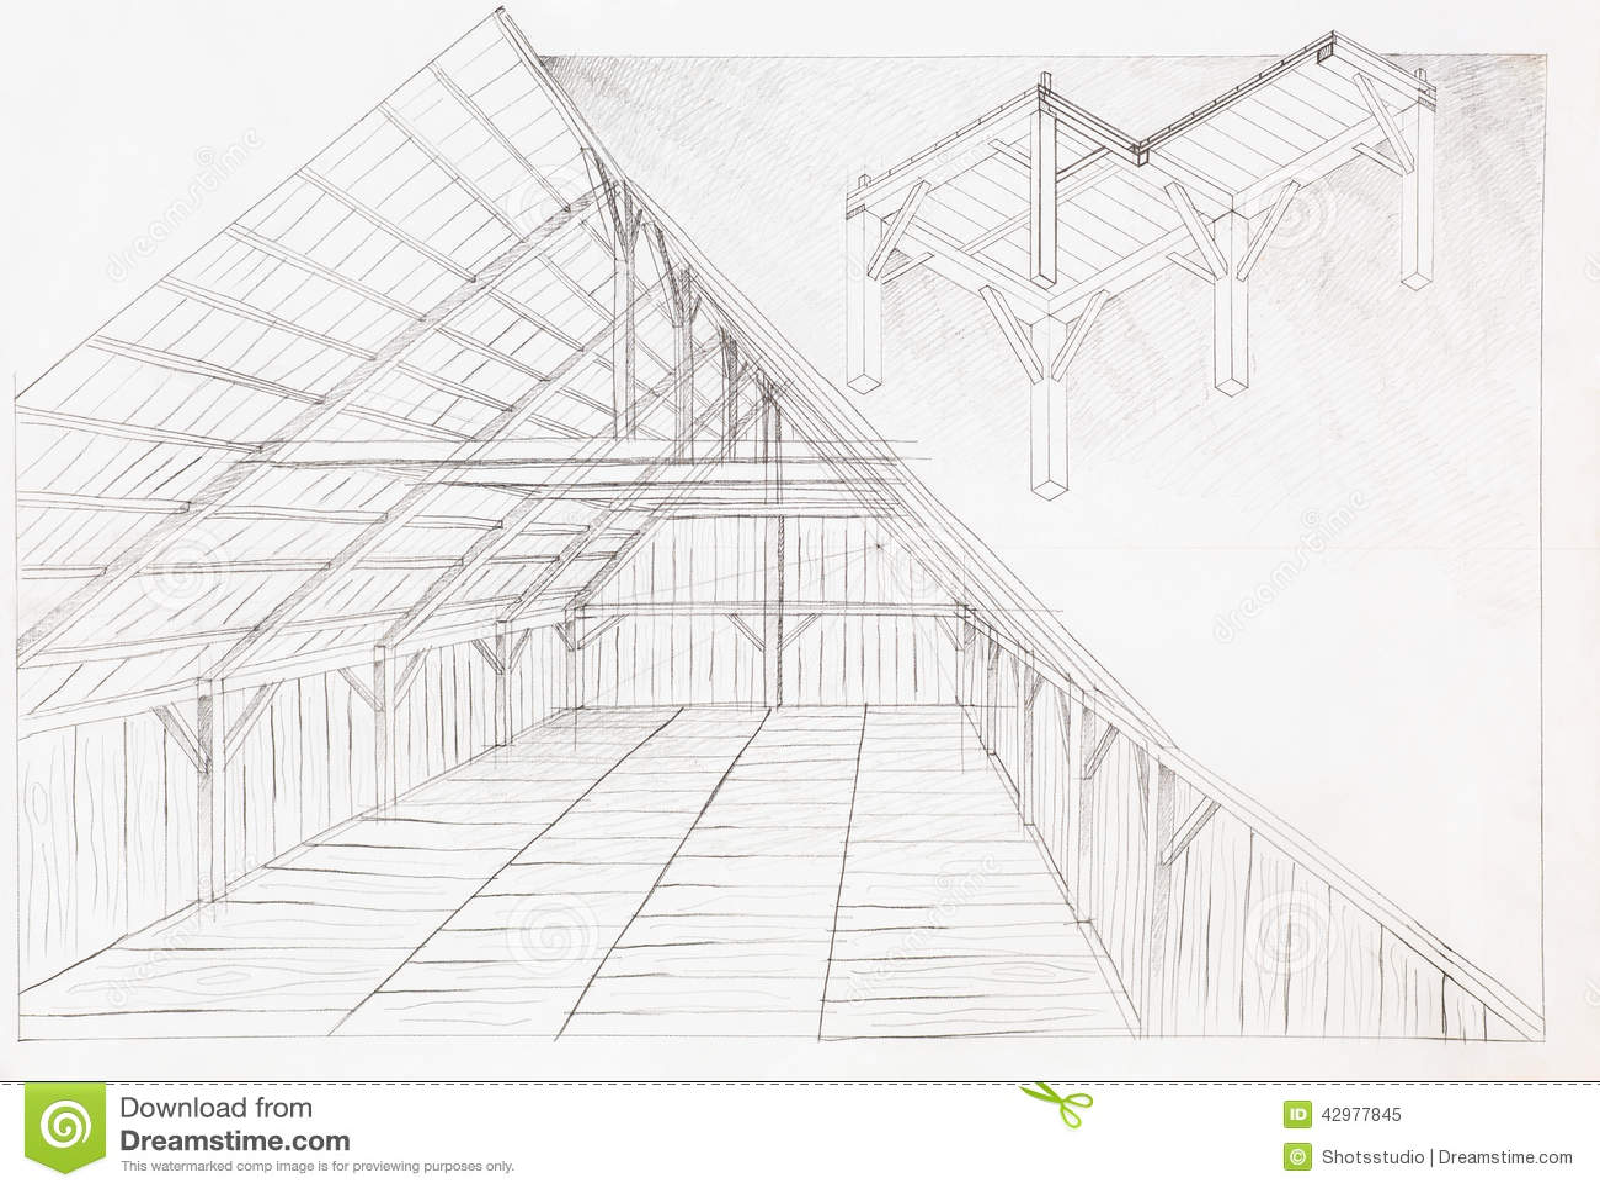 Wooden Attic Architectural Sketch Stock Illustration